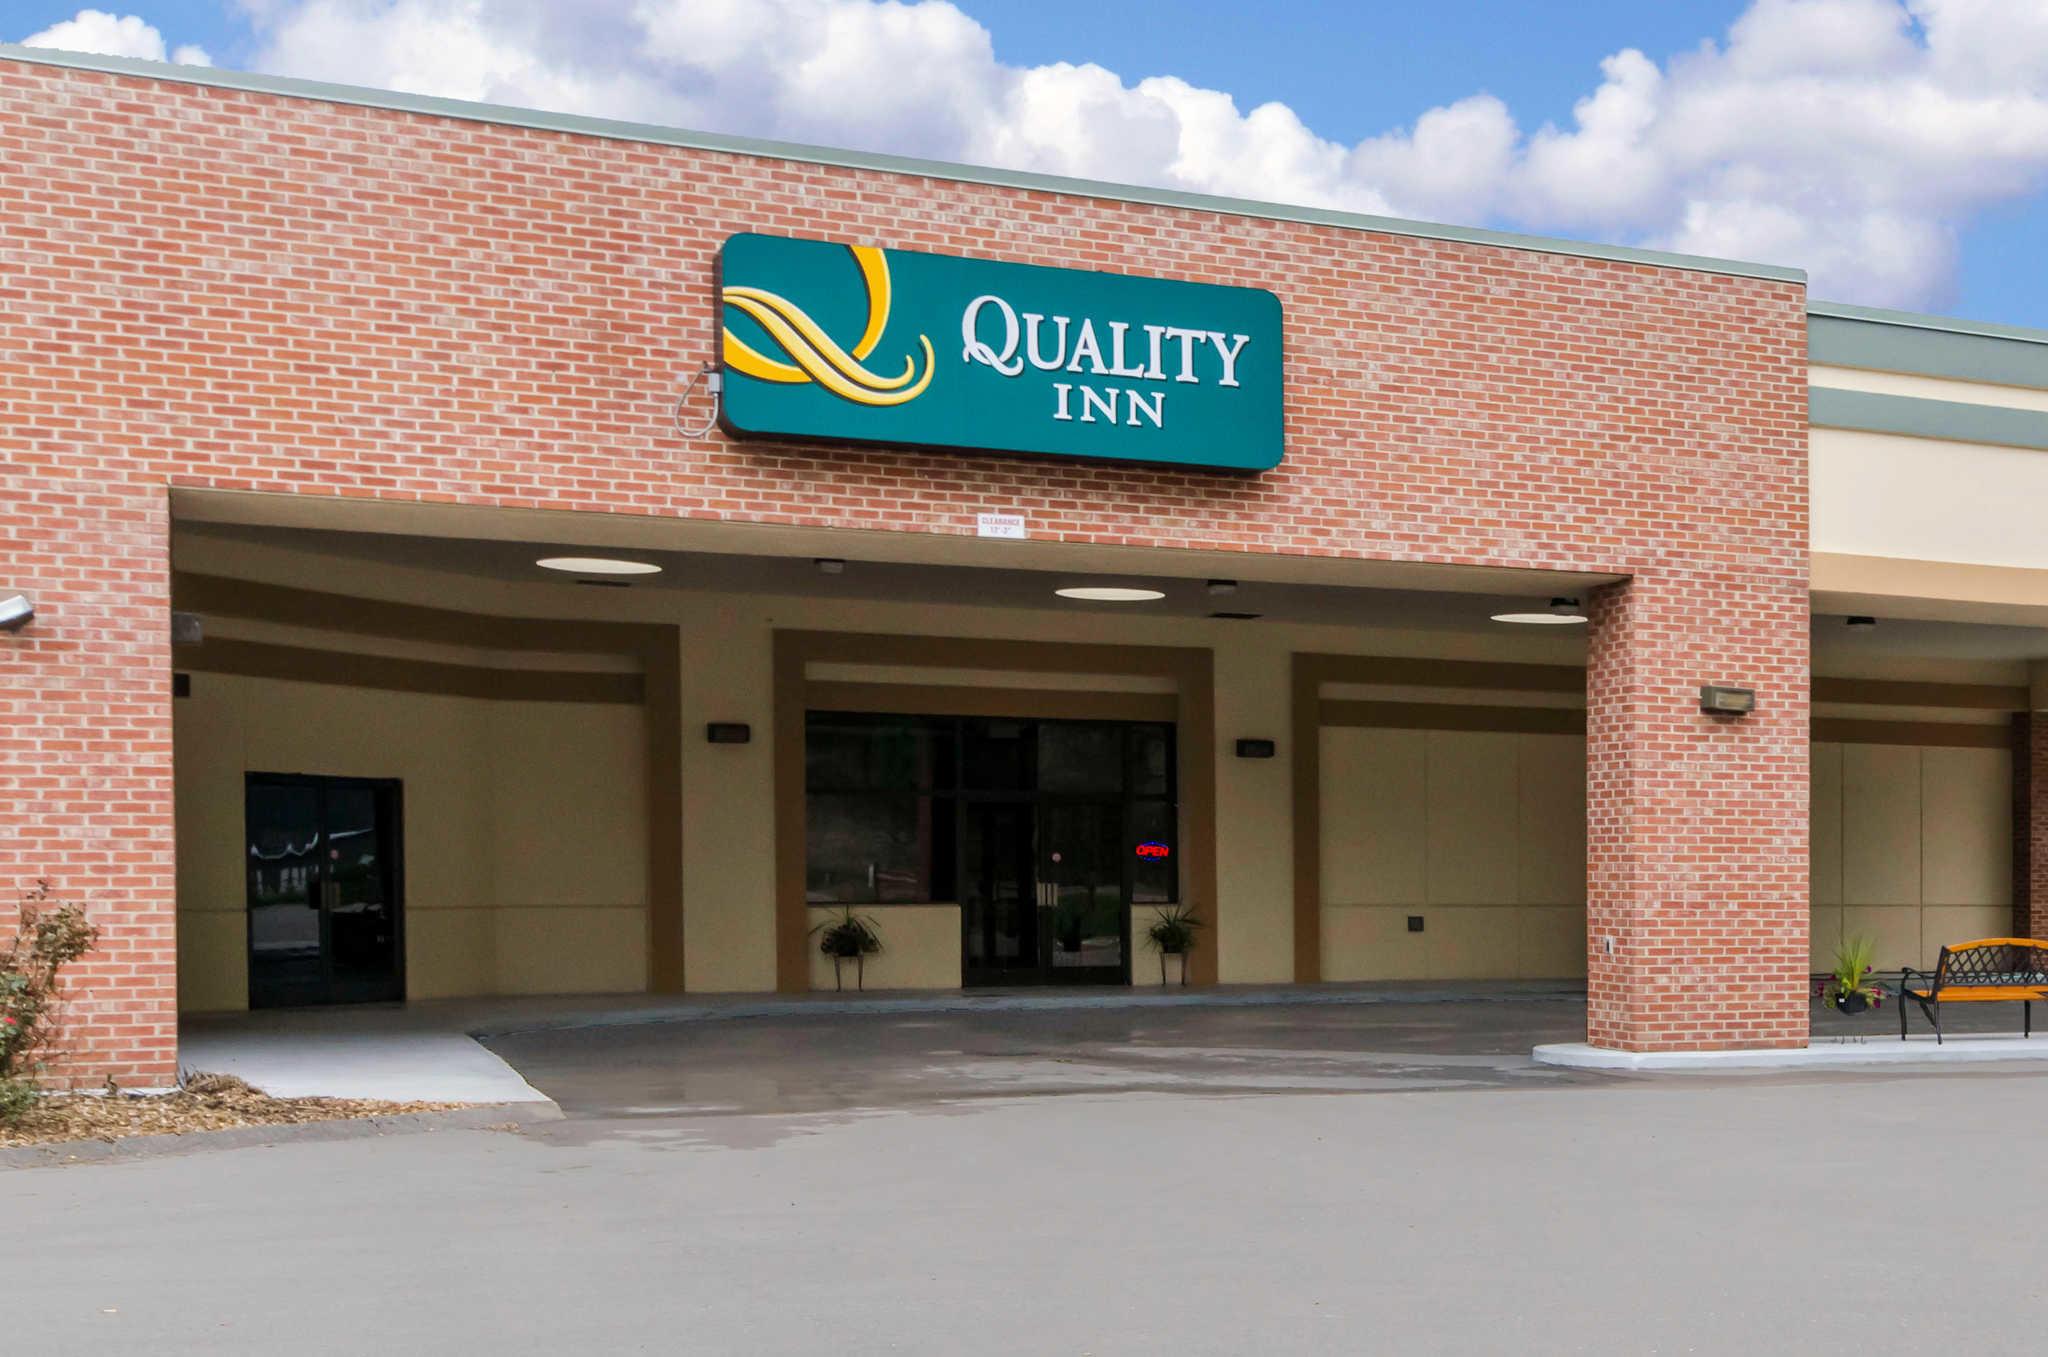 Quality Inn - Closed image 0